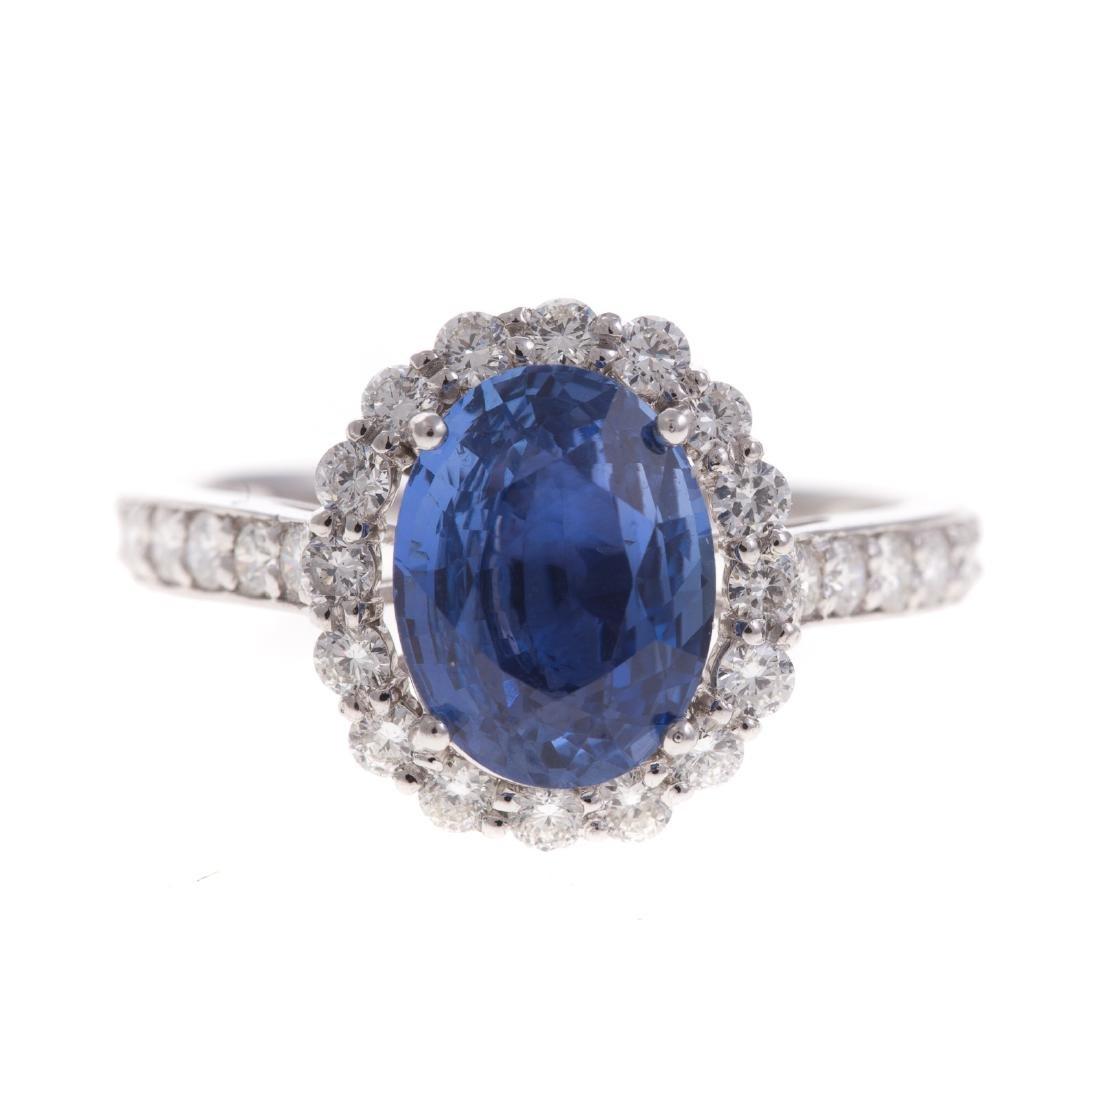 A Lady's 3.21 ct Unheated Sapphire & Diamond Ring